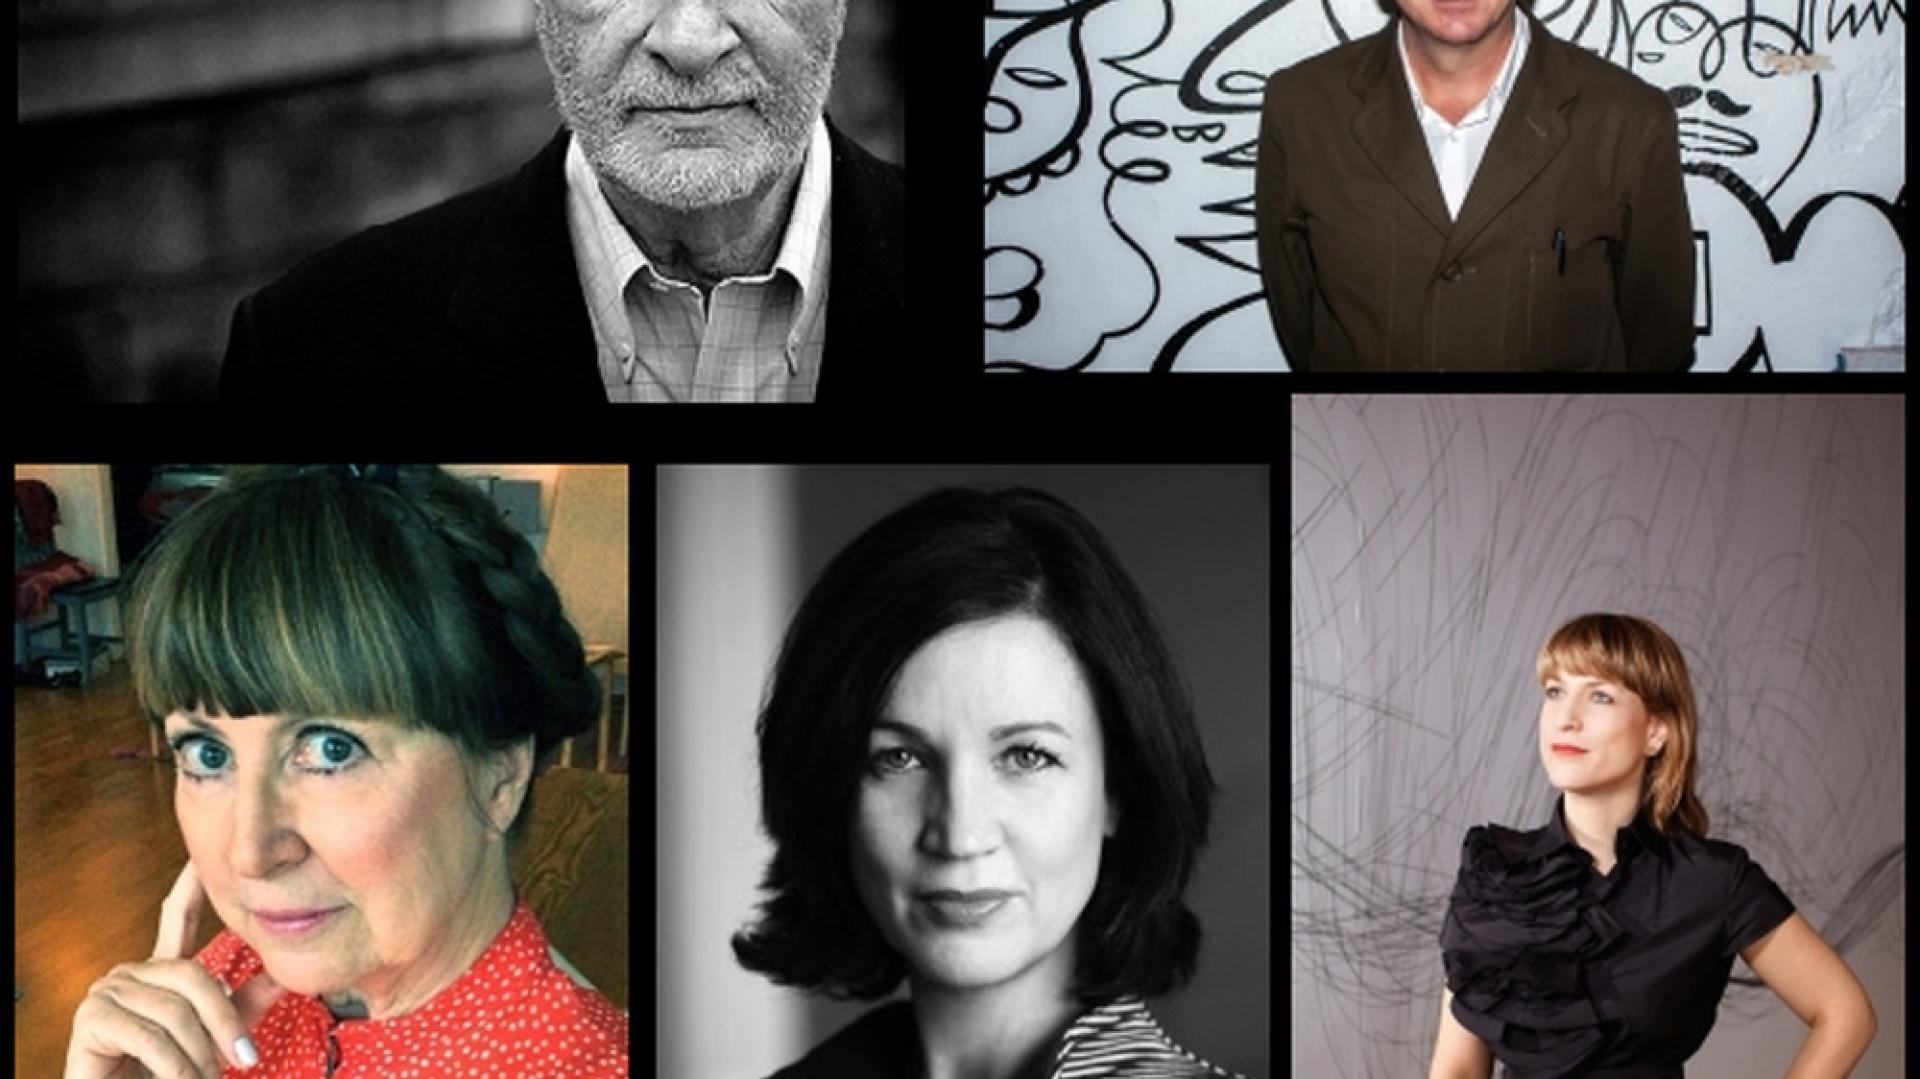 Prelegenci debaty w ASP, Gianni Vattimo, Guy Julier, Maria Benktzon, Alison J. Clarke, Zoë Ryan.  Fot. Materiały prasowe